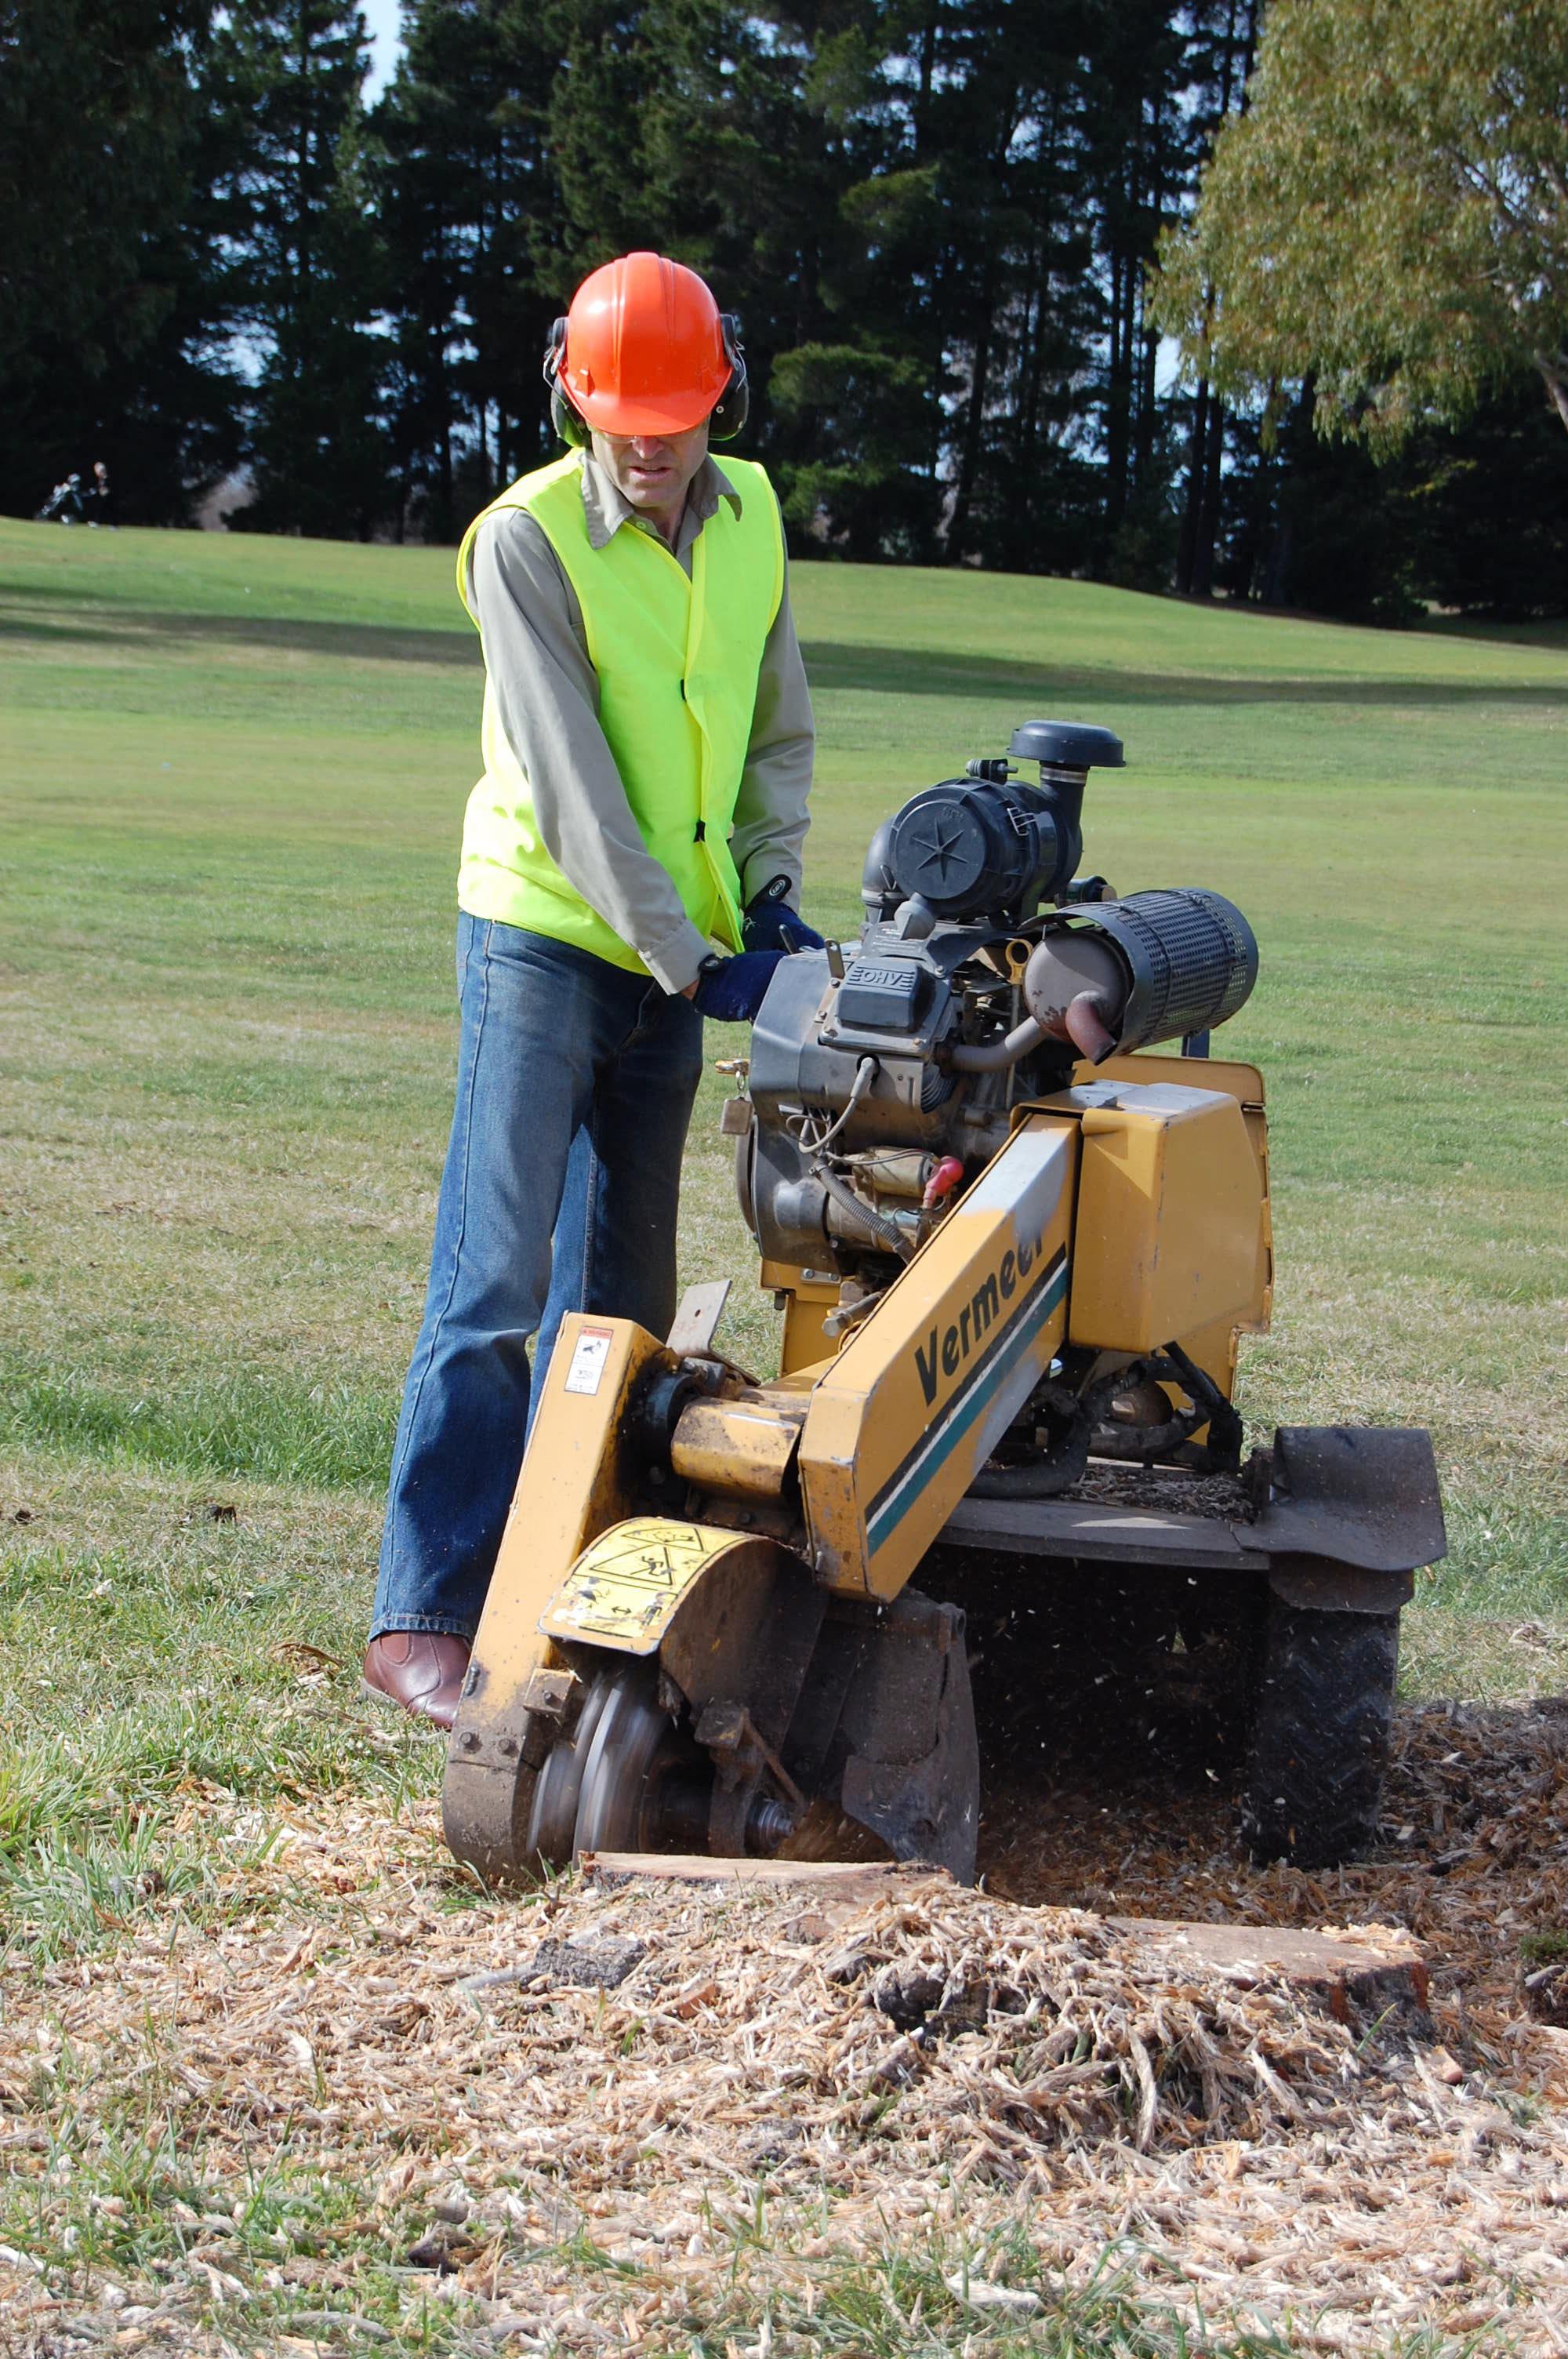 Expert using stump grinding machine to clear stump